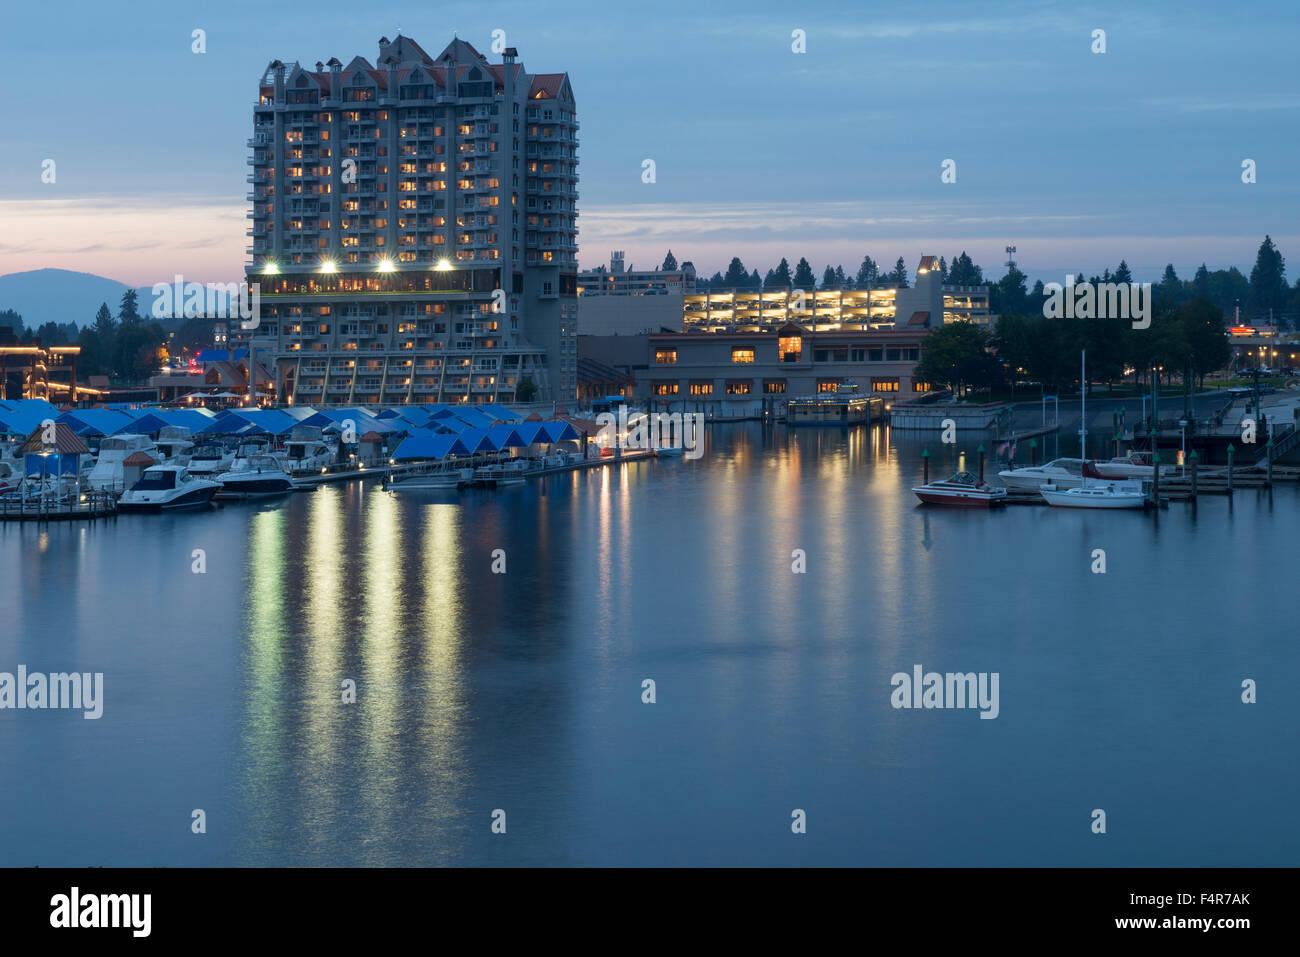 USA, United States, America, Idaho, Coeur d'Alene, Rockies, rocky mountains, lakefront, building, dusk, lake, - Stock Image